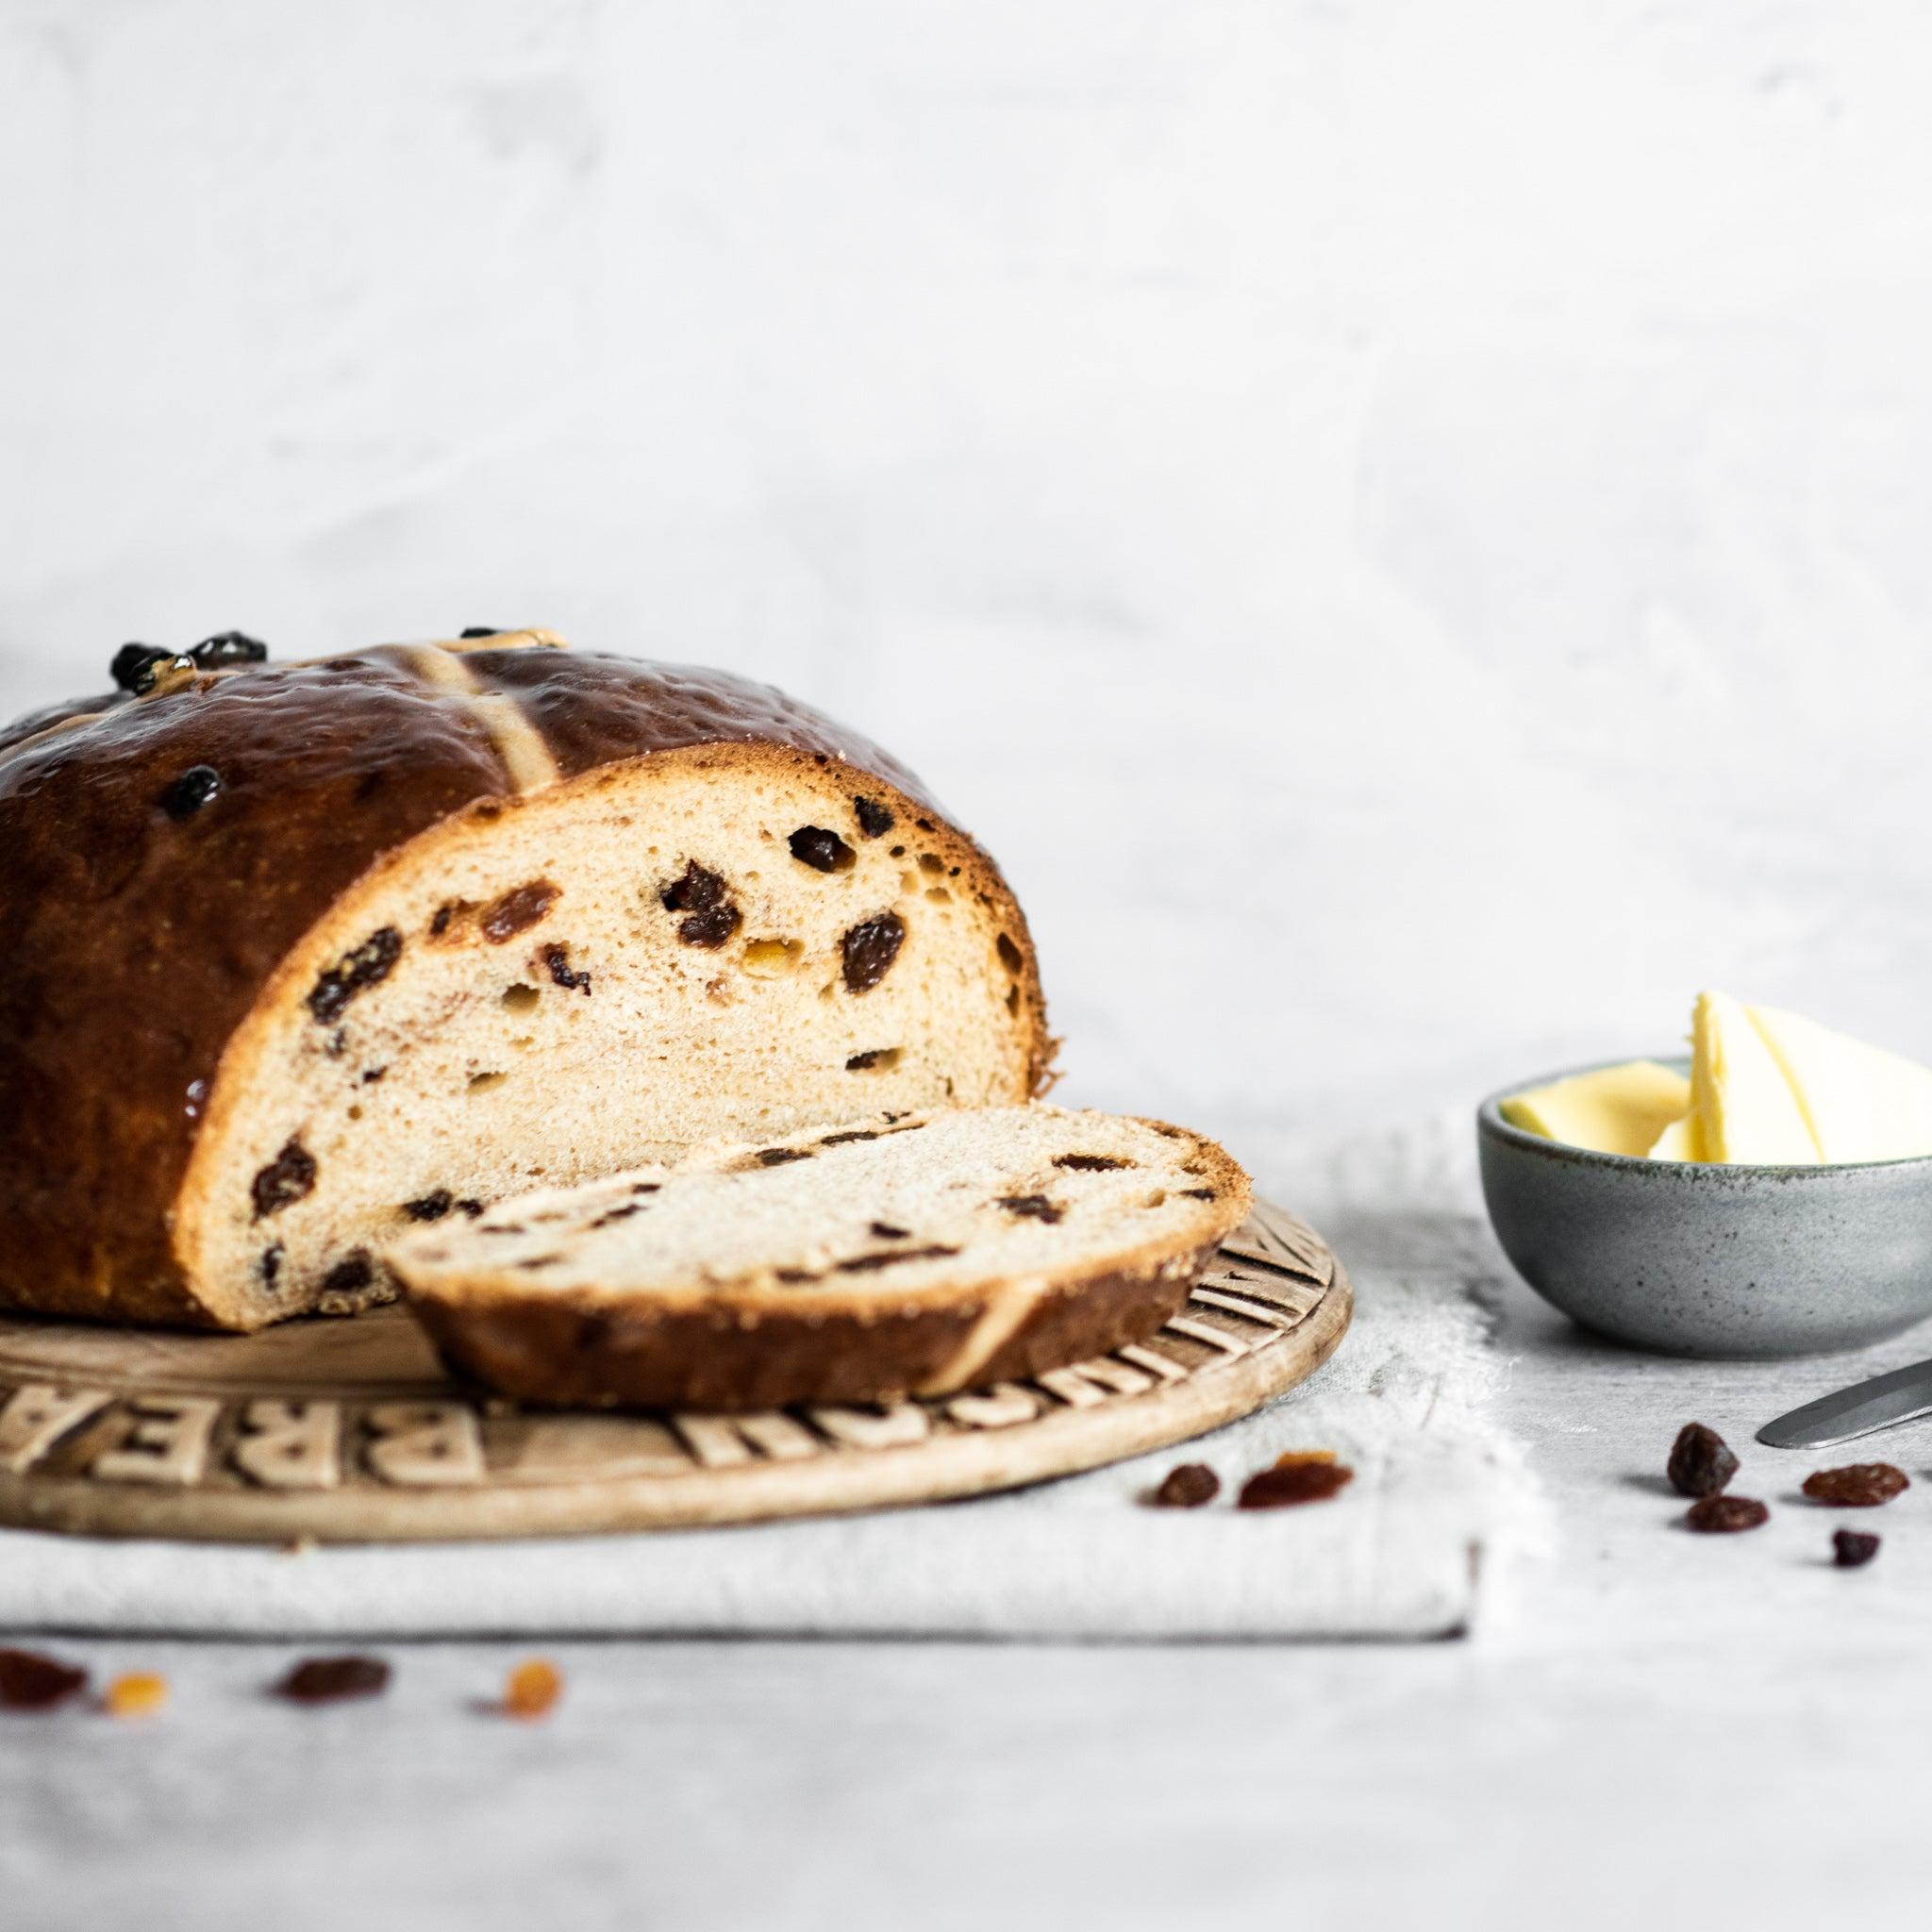 Hot-Cross-Bun-Loaf-SQUARE-4.jpg